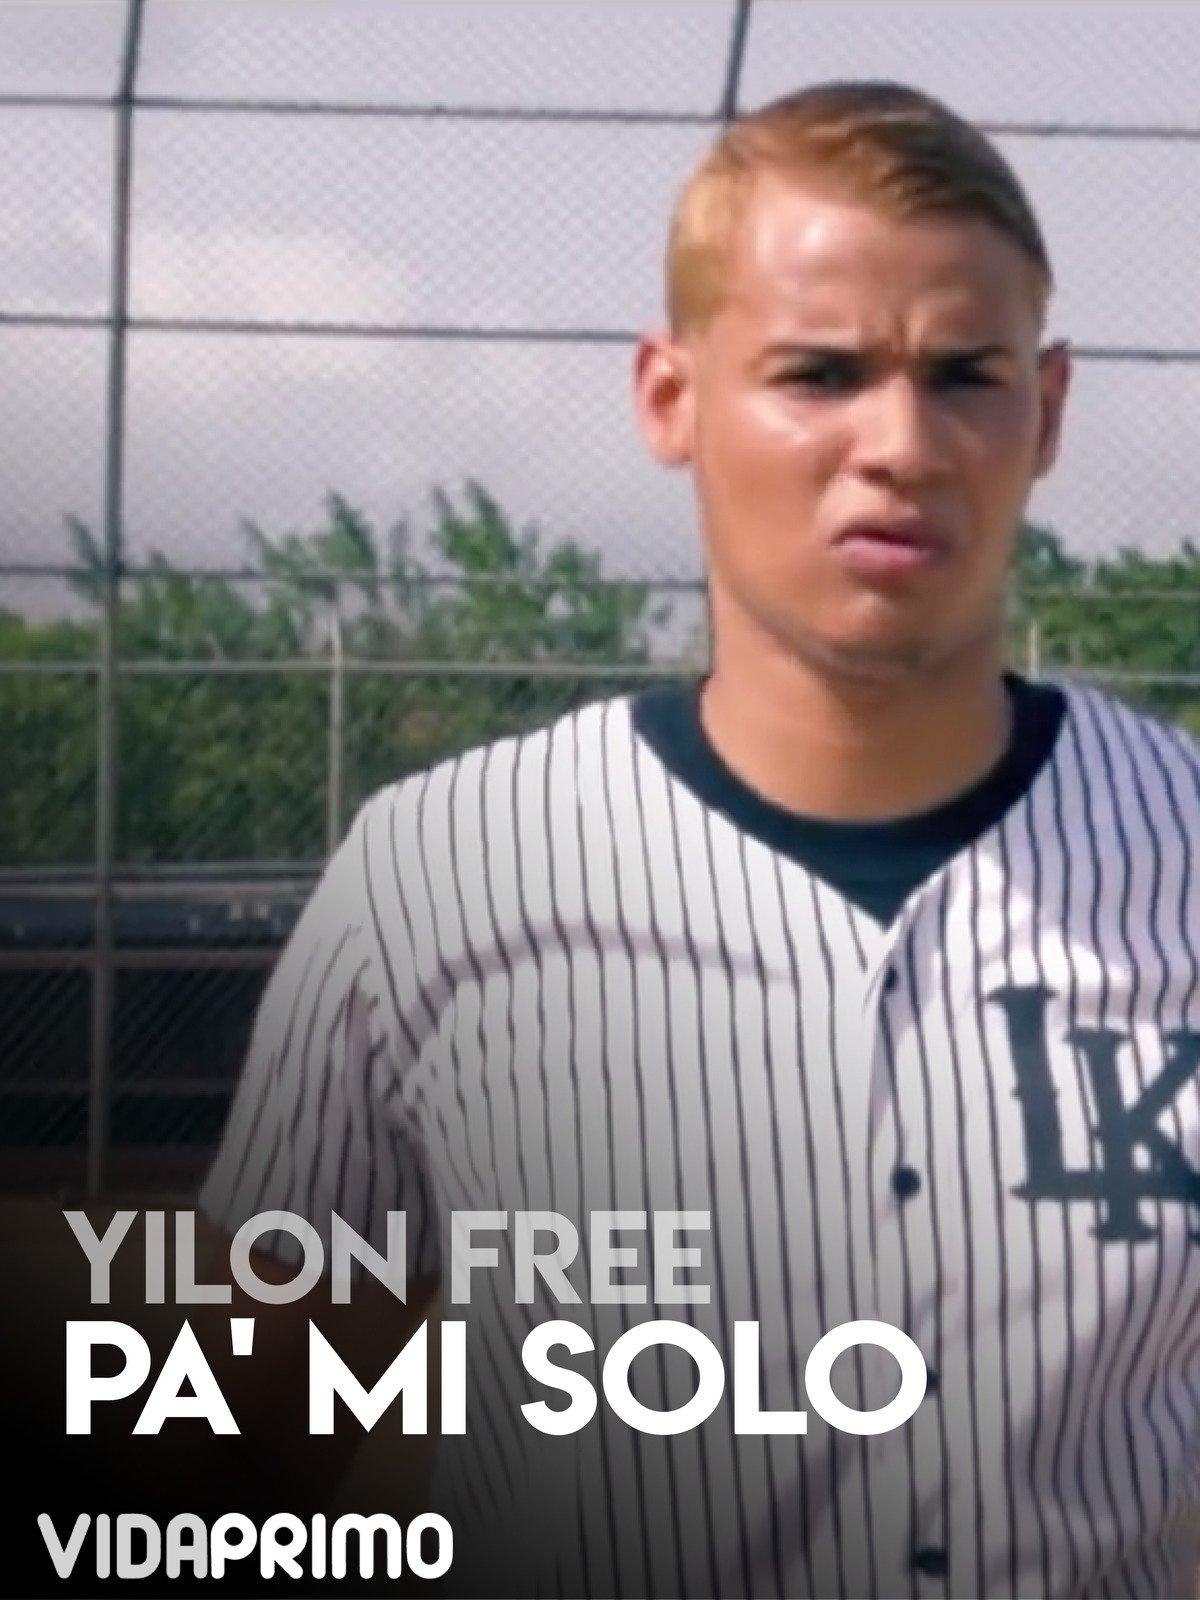 Yilon Free